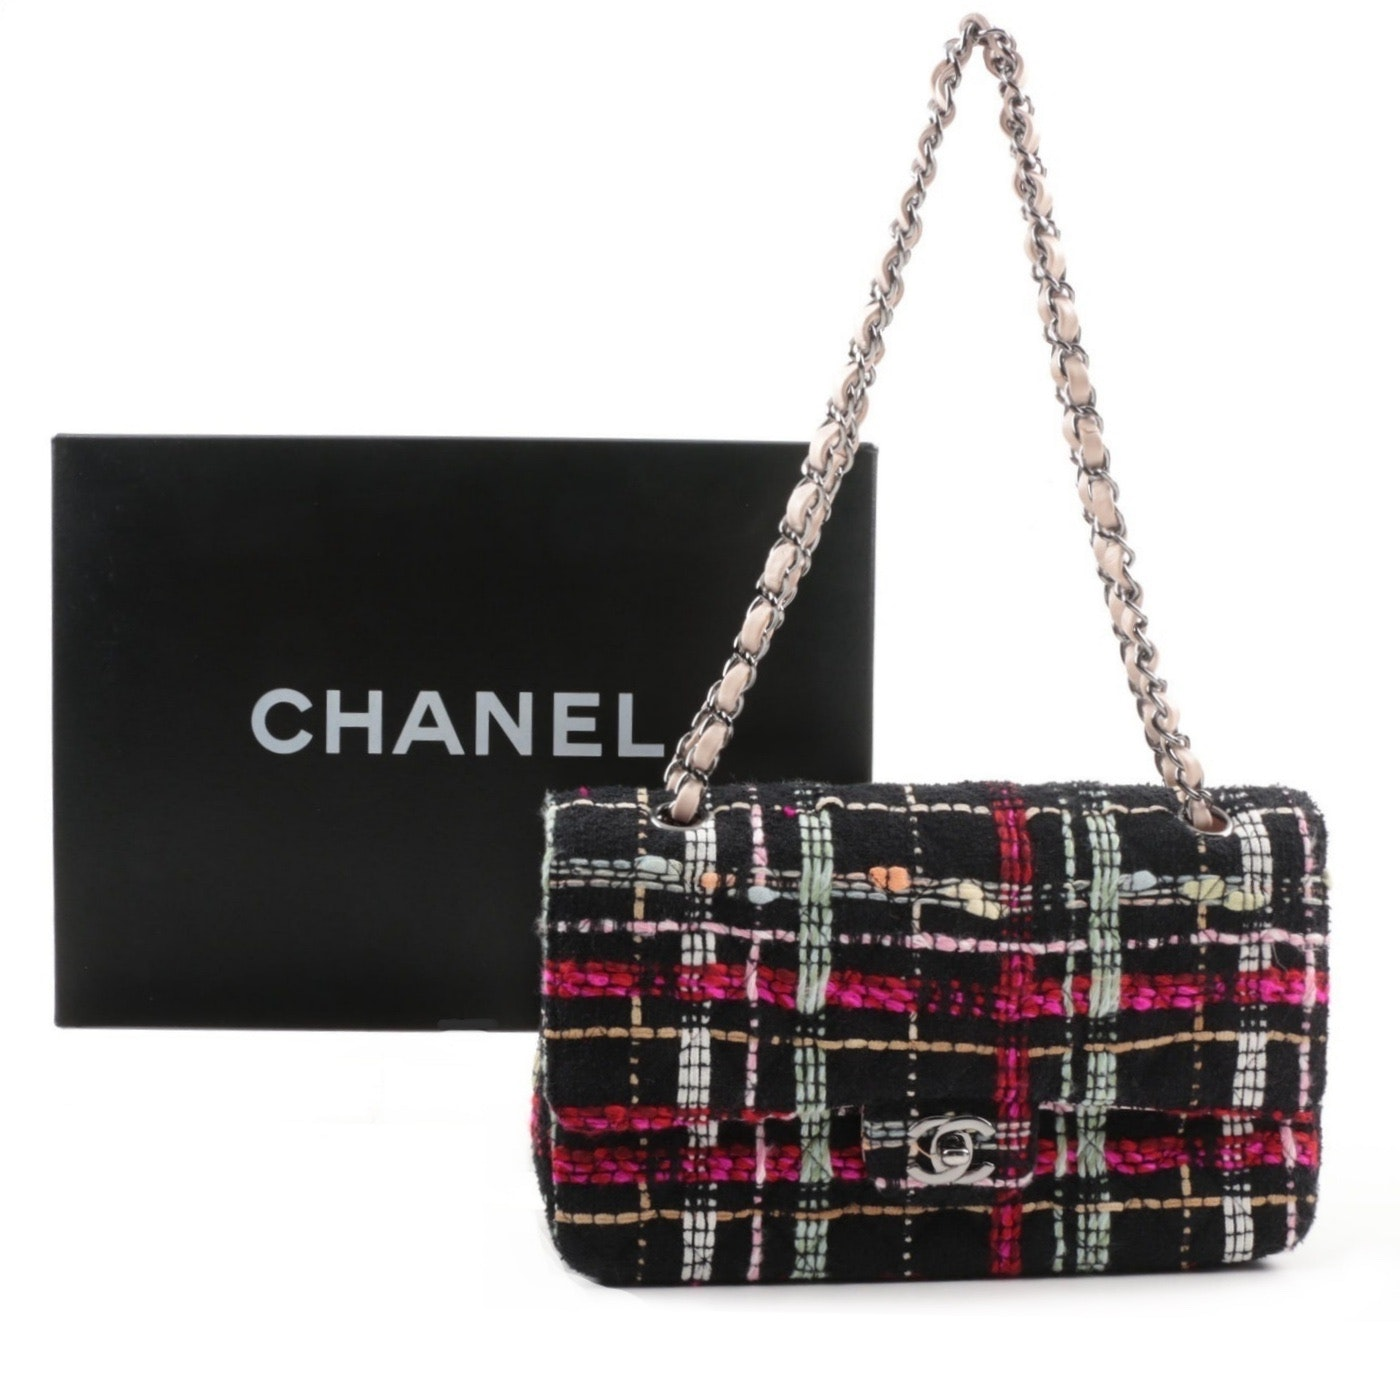 Chanel Black Tweed Medium Double Flap Handbag